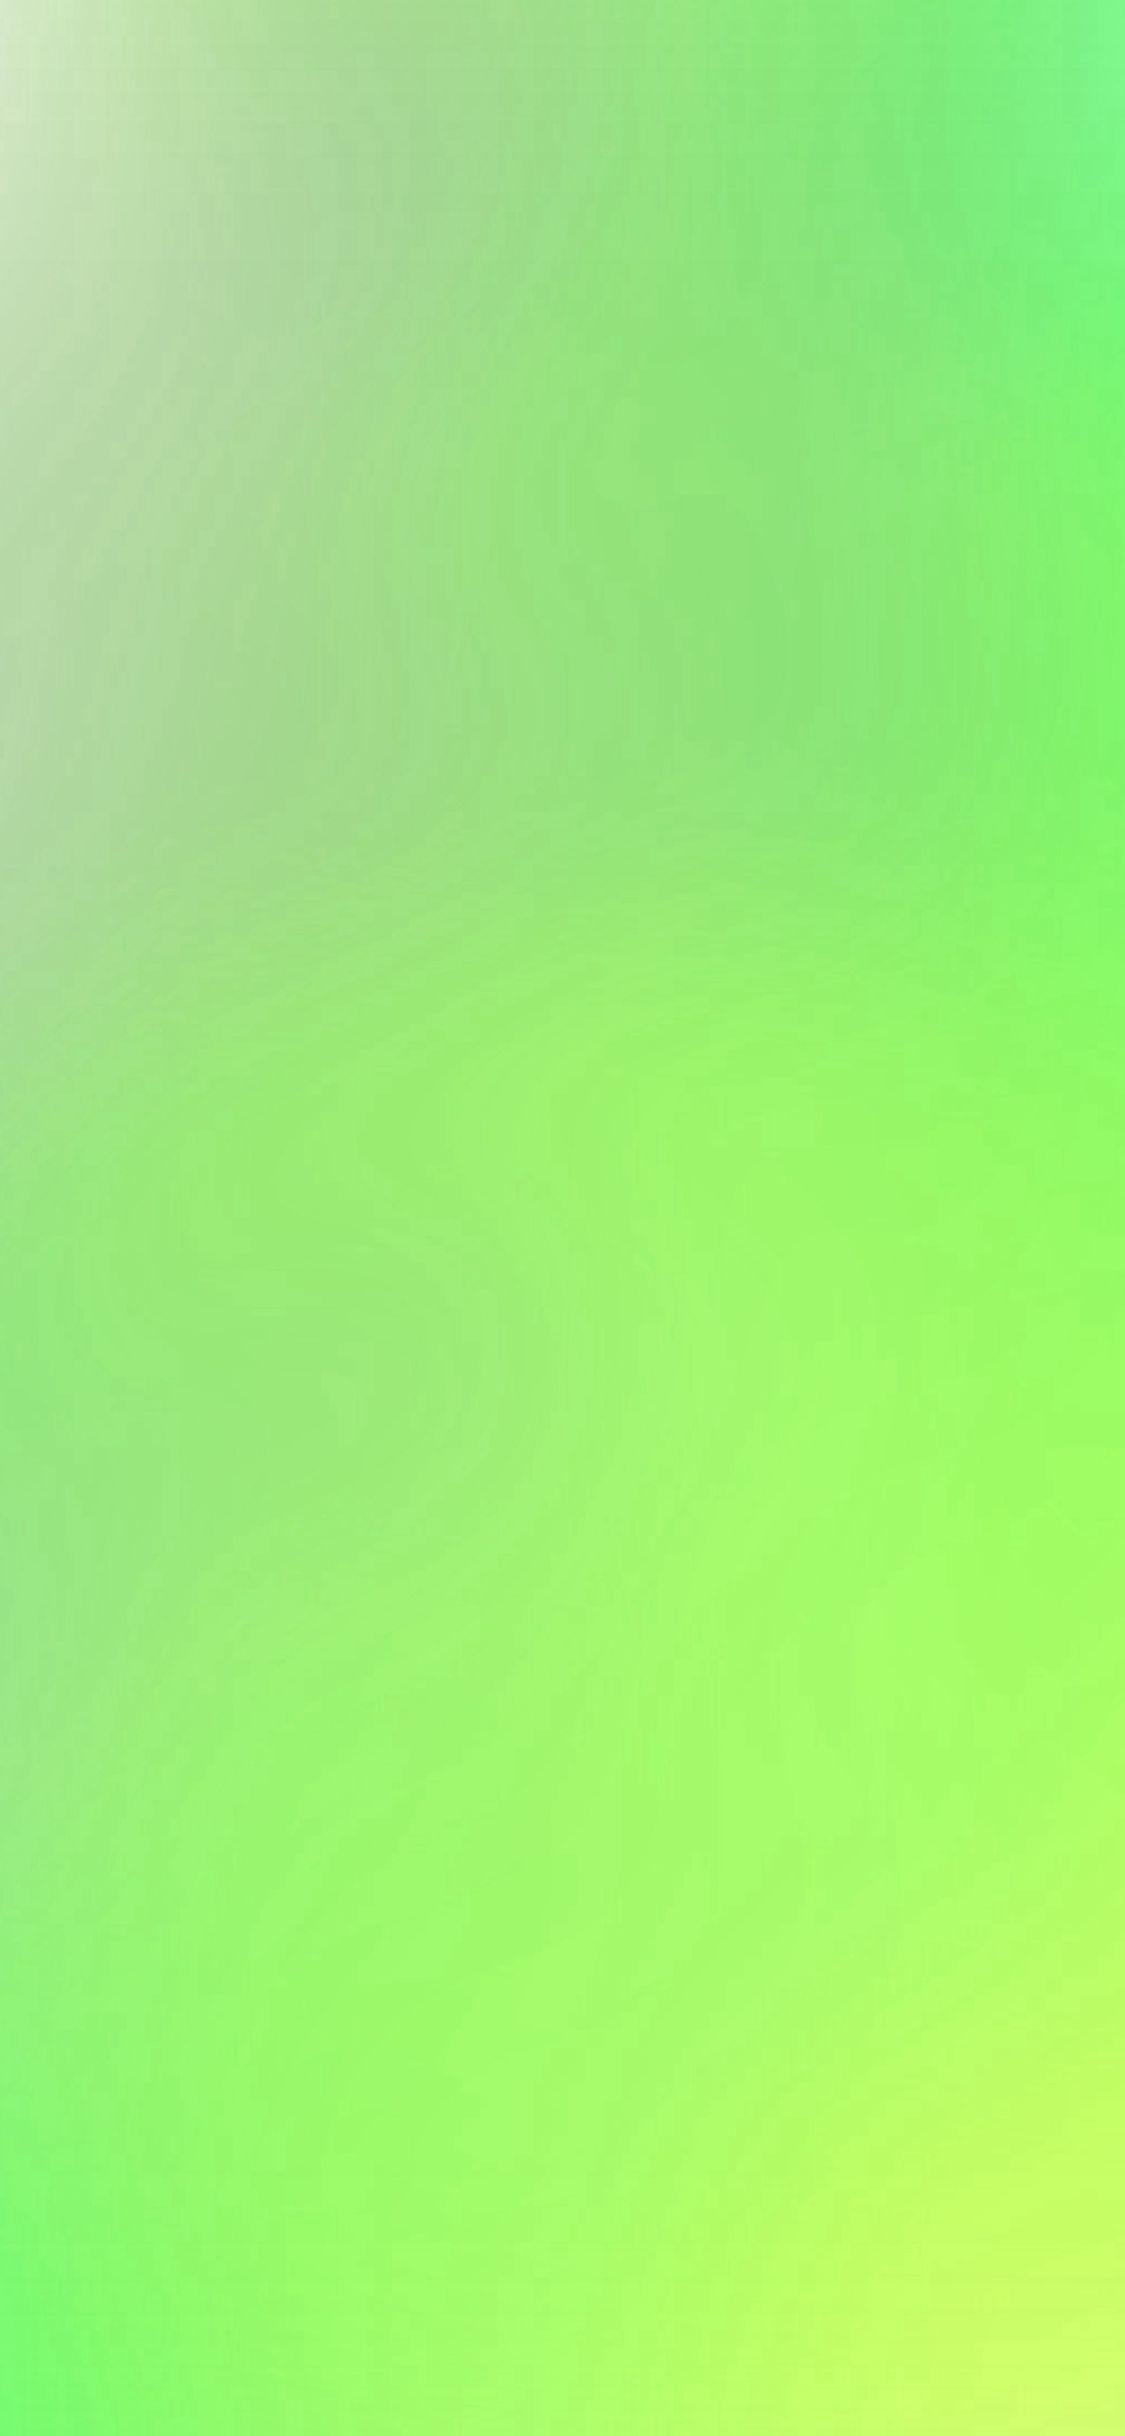 Green Yellow Blur Gradation Iphone X Wallpaper Iphone X